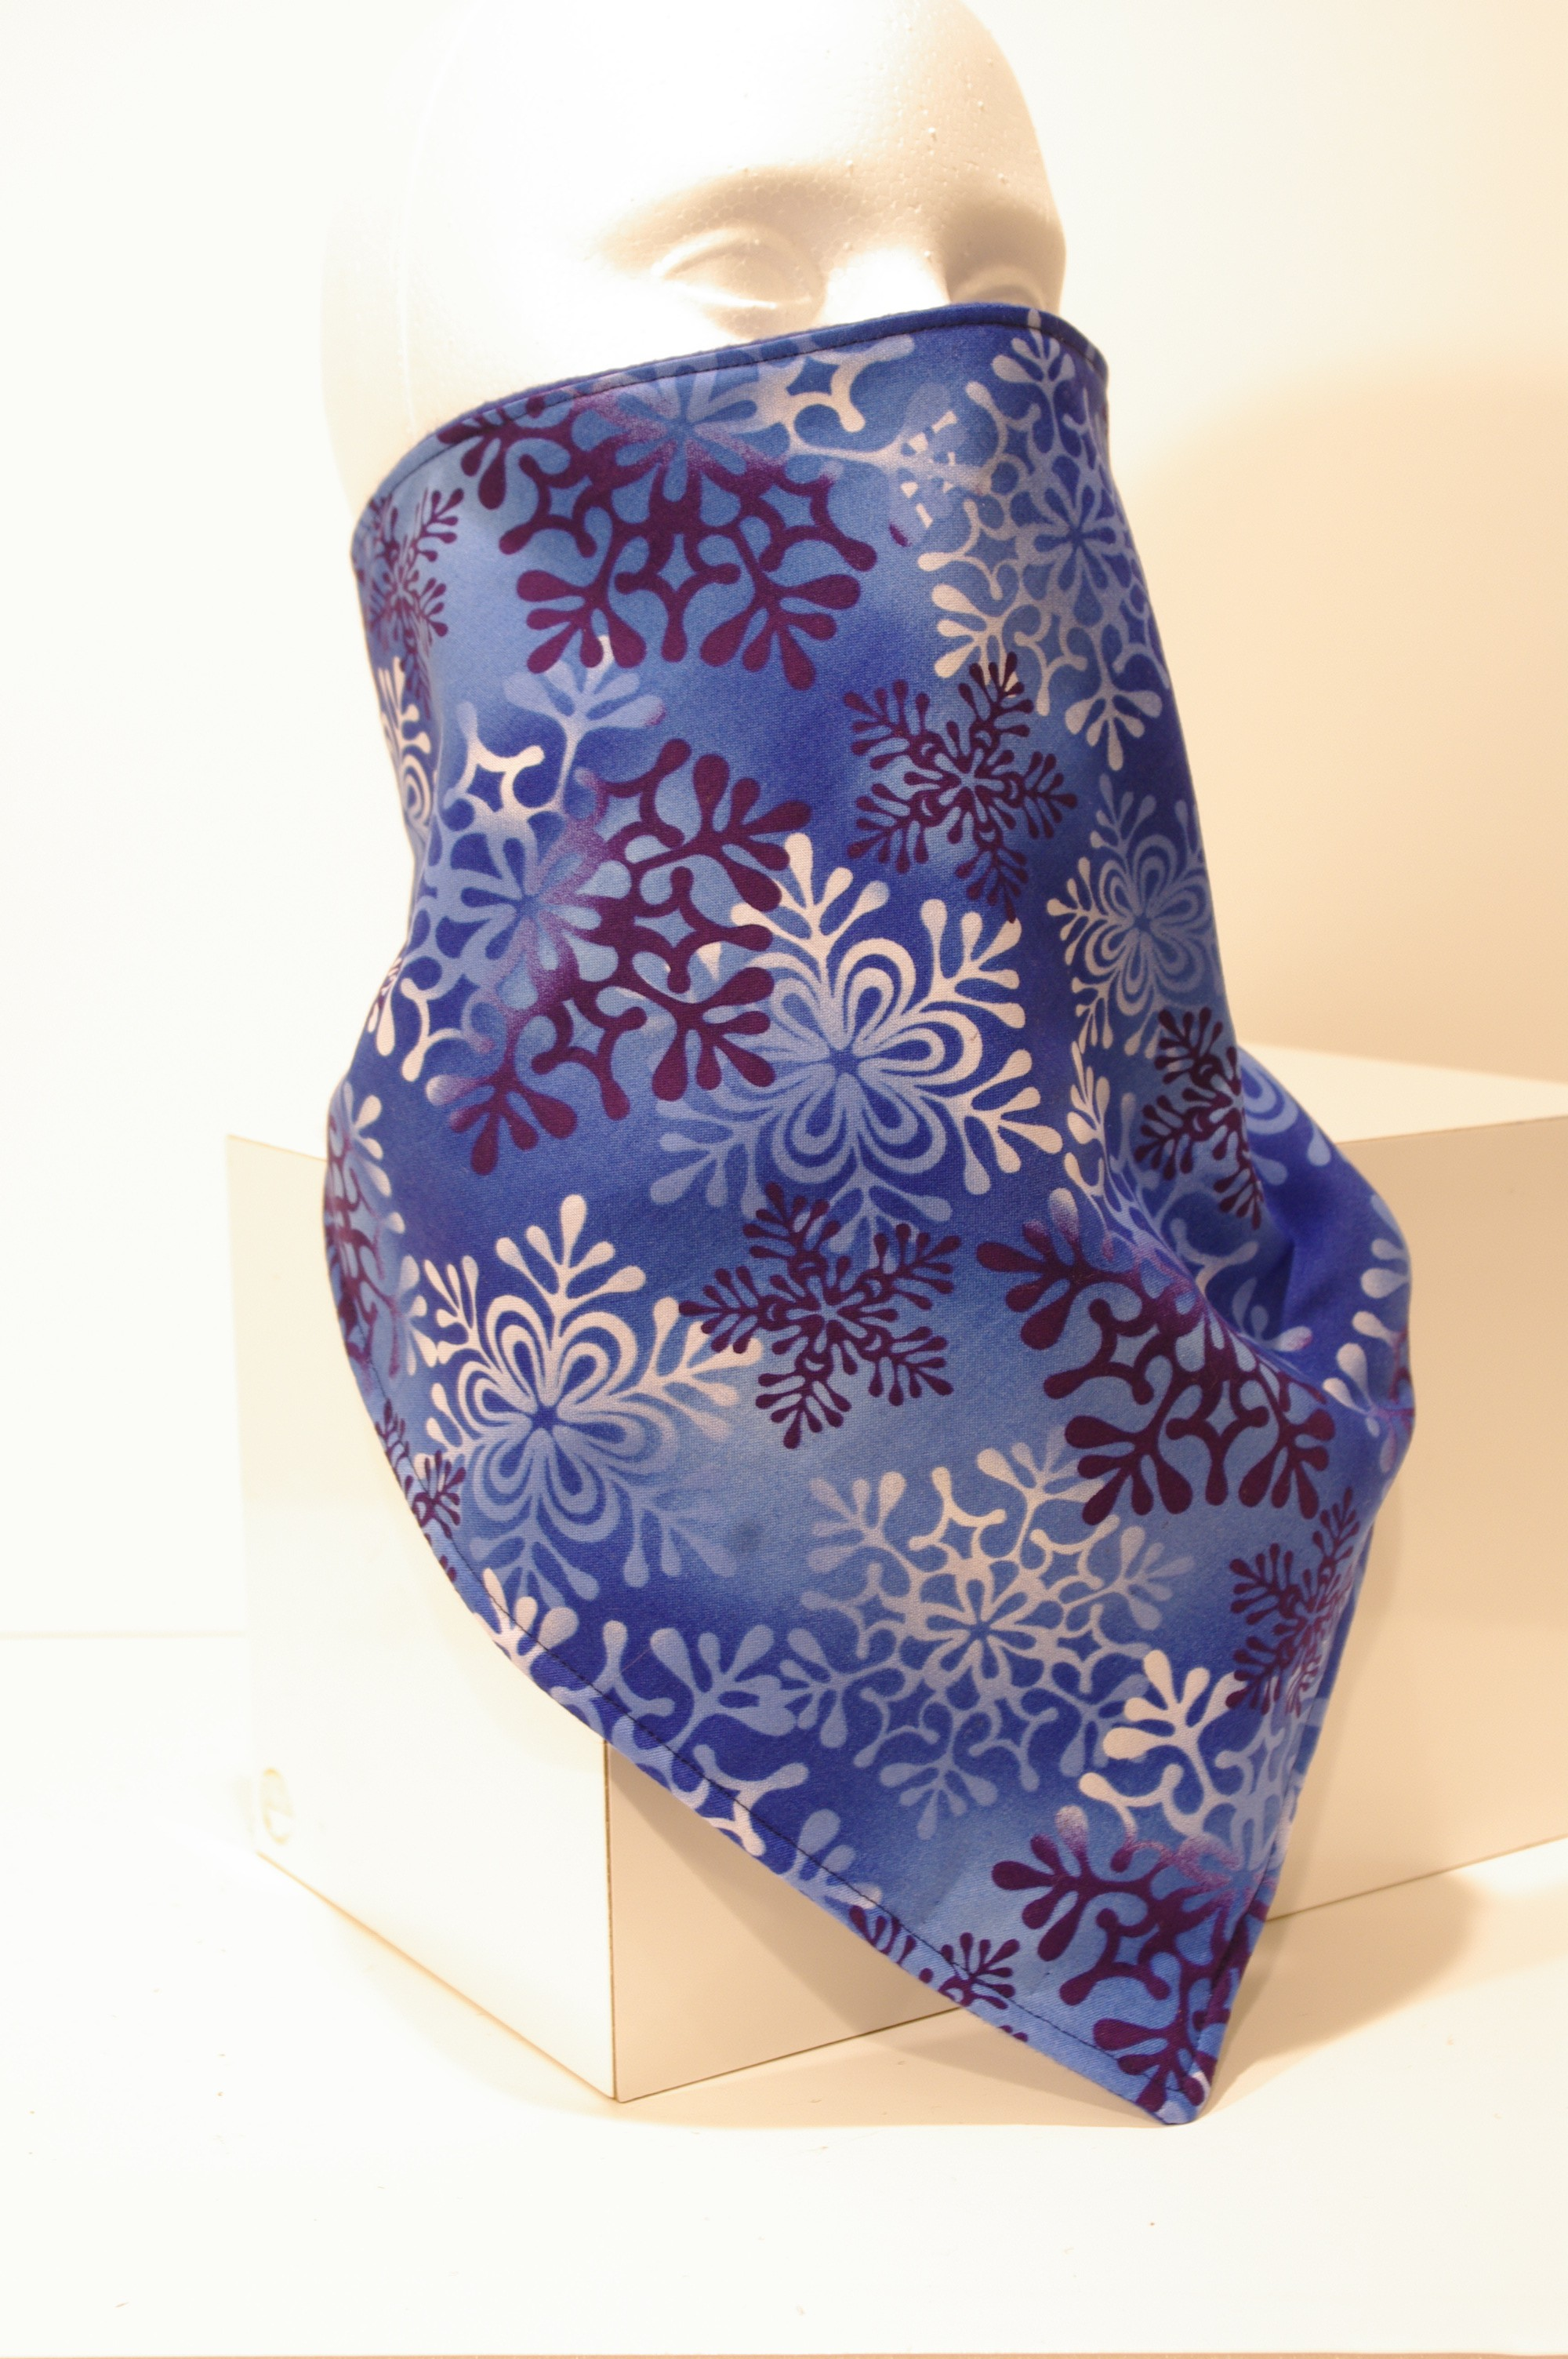 #050 Blue Snowflakes